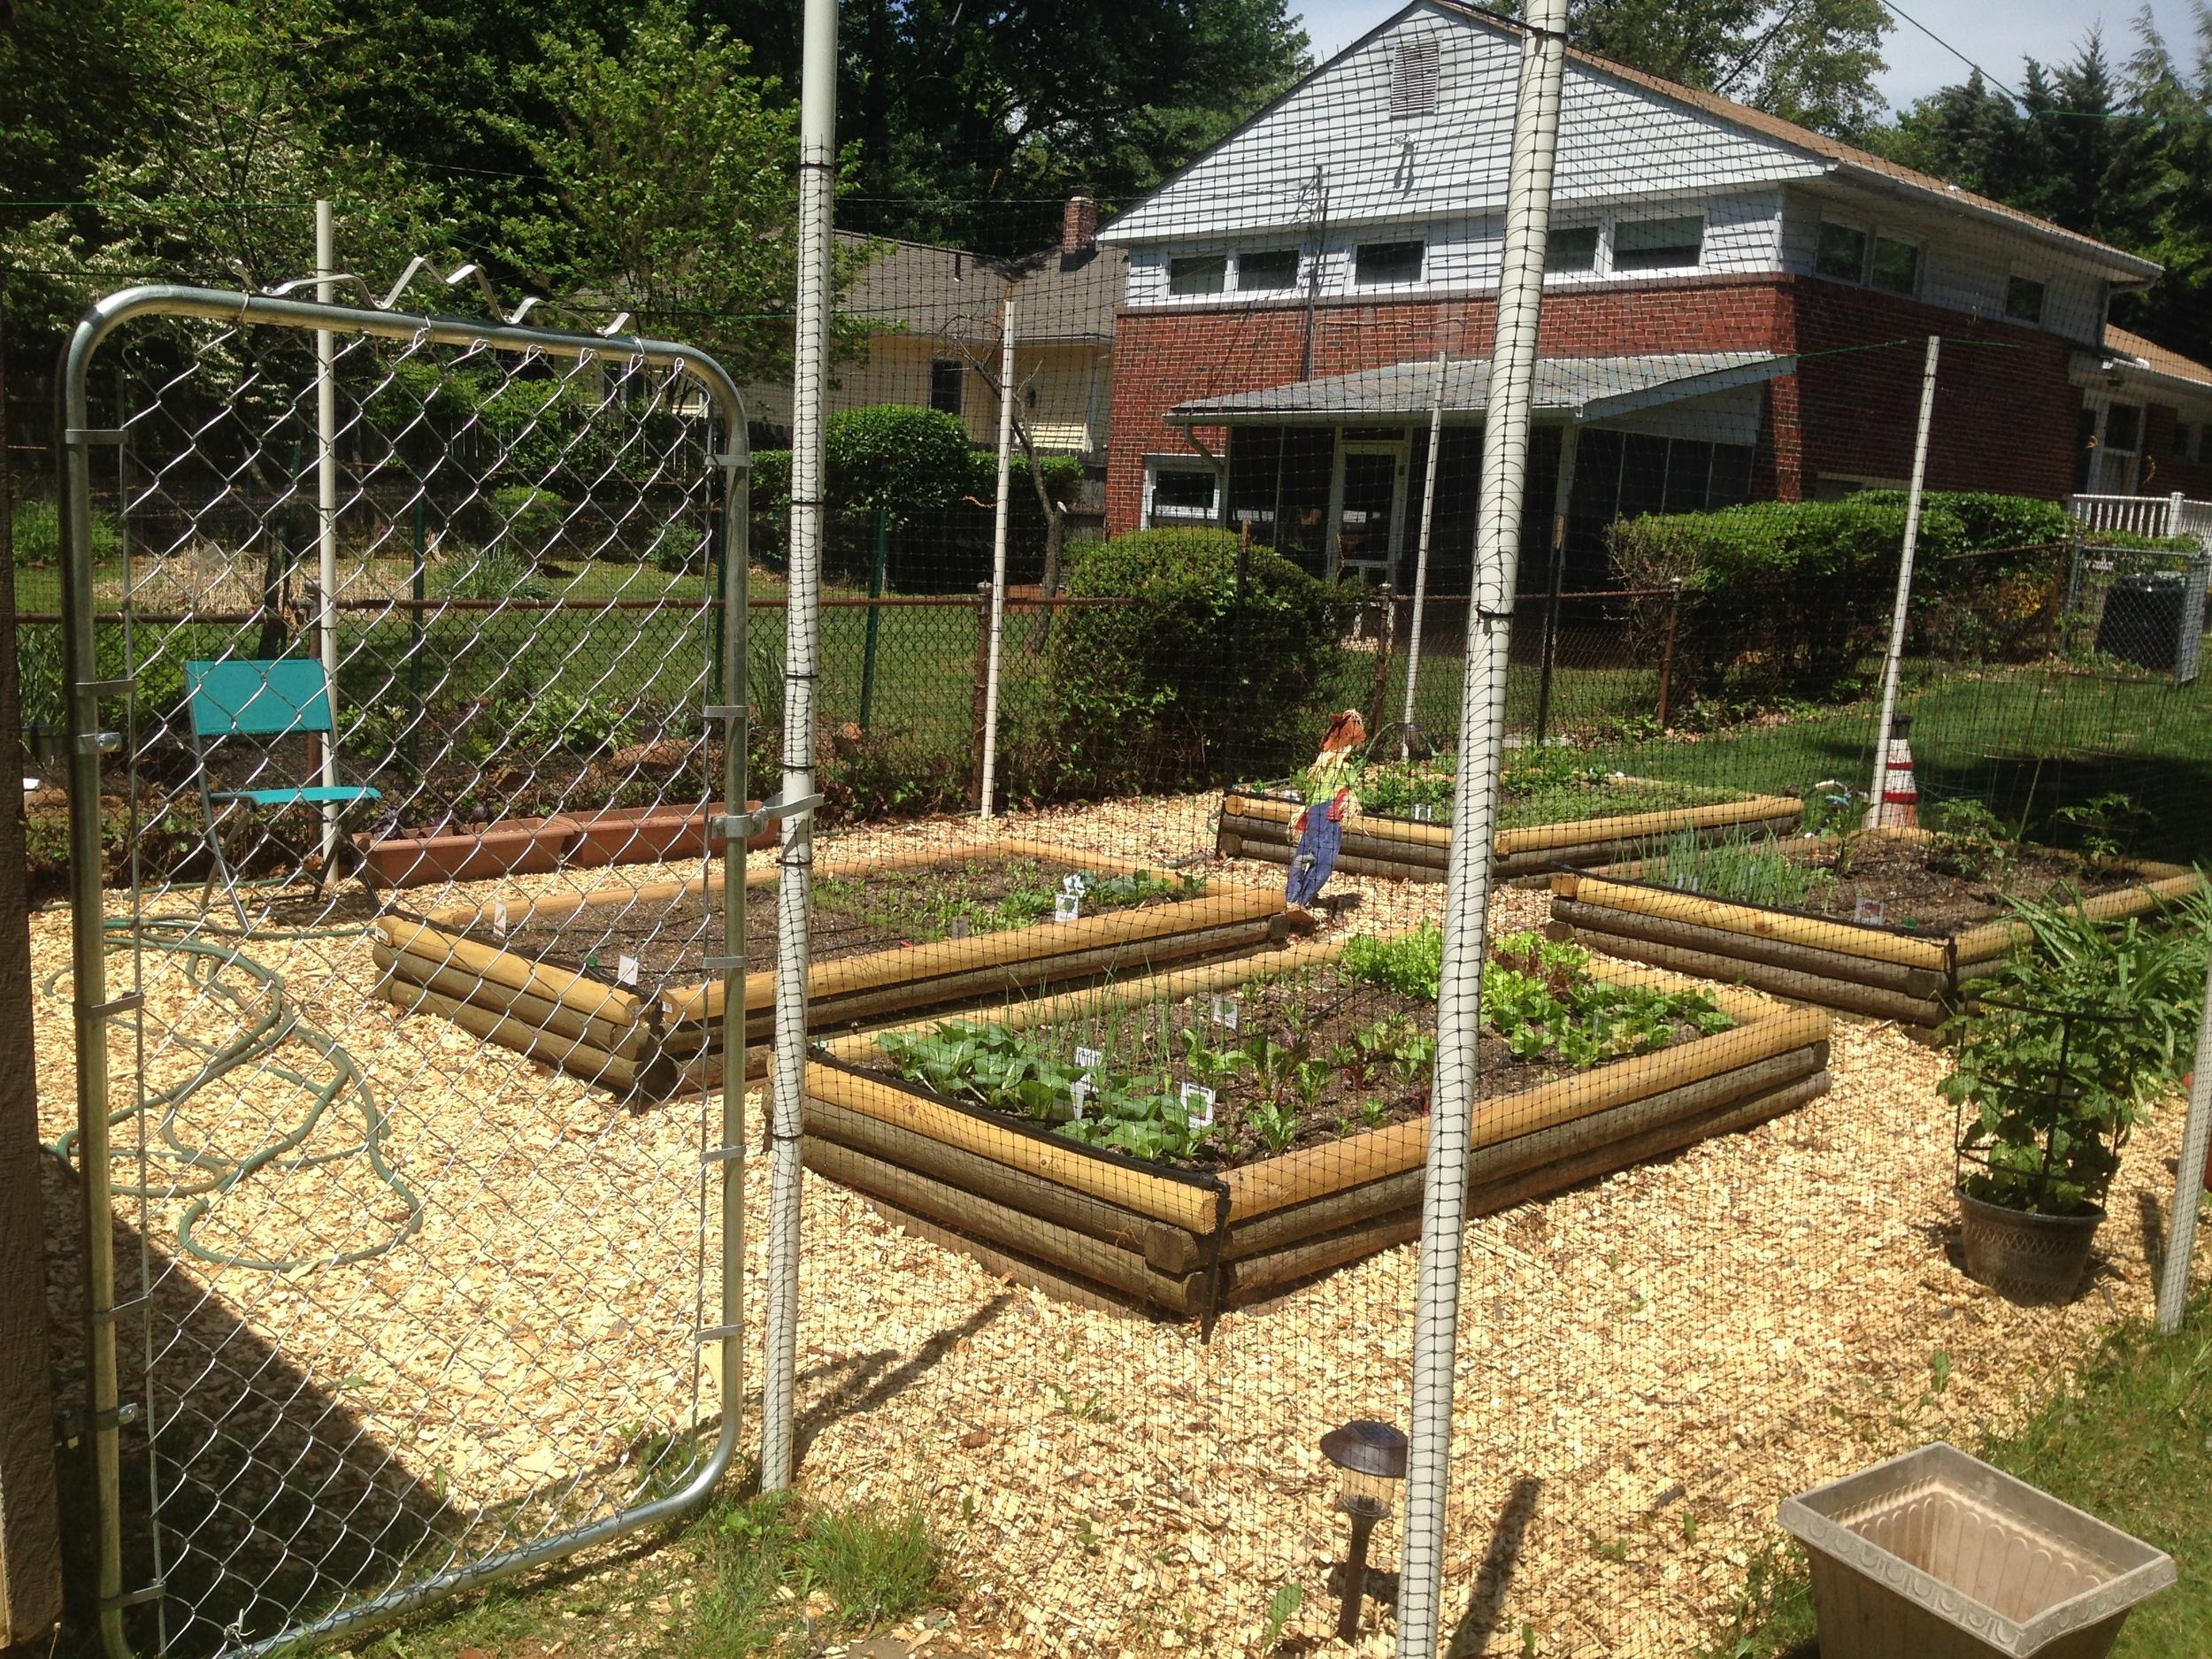 Garden Design Plan Urban Gardening Agriculture Fence Home